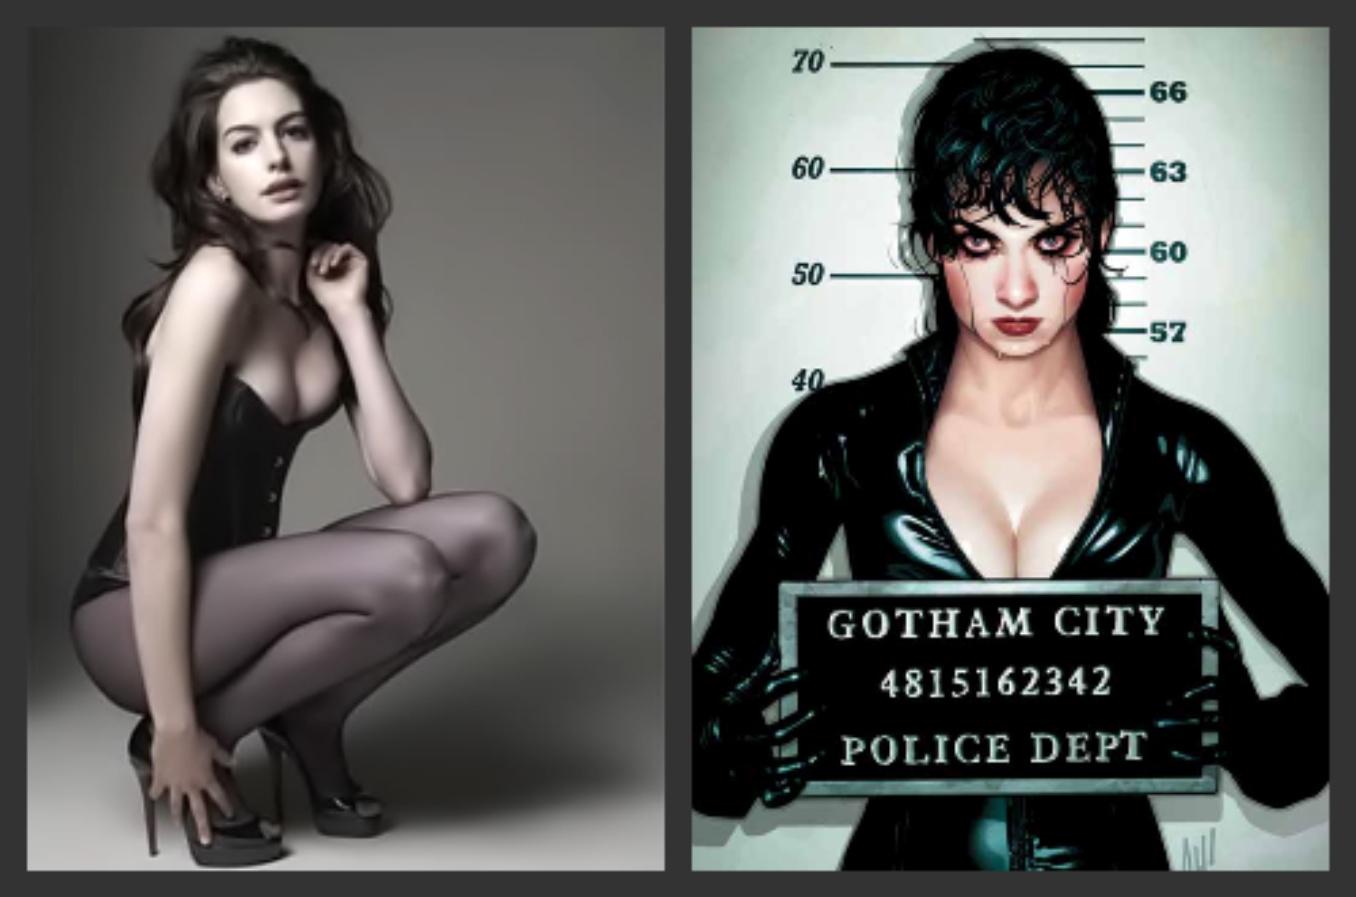 http://3.bp.blogspot.com/-q9nEn4aQid4/T3HGiQz2iiI/AAAAAAAABjQ/co3ZdgmfXUI/s1600/Anne-Hathaway-Catwoman.jpg